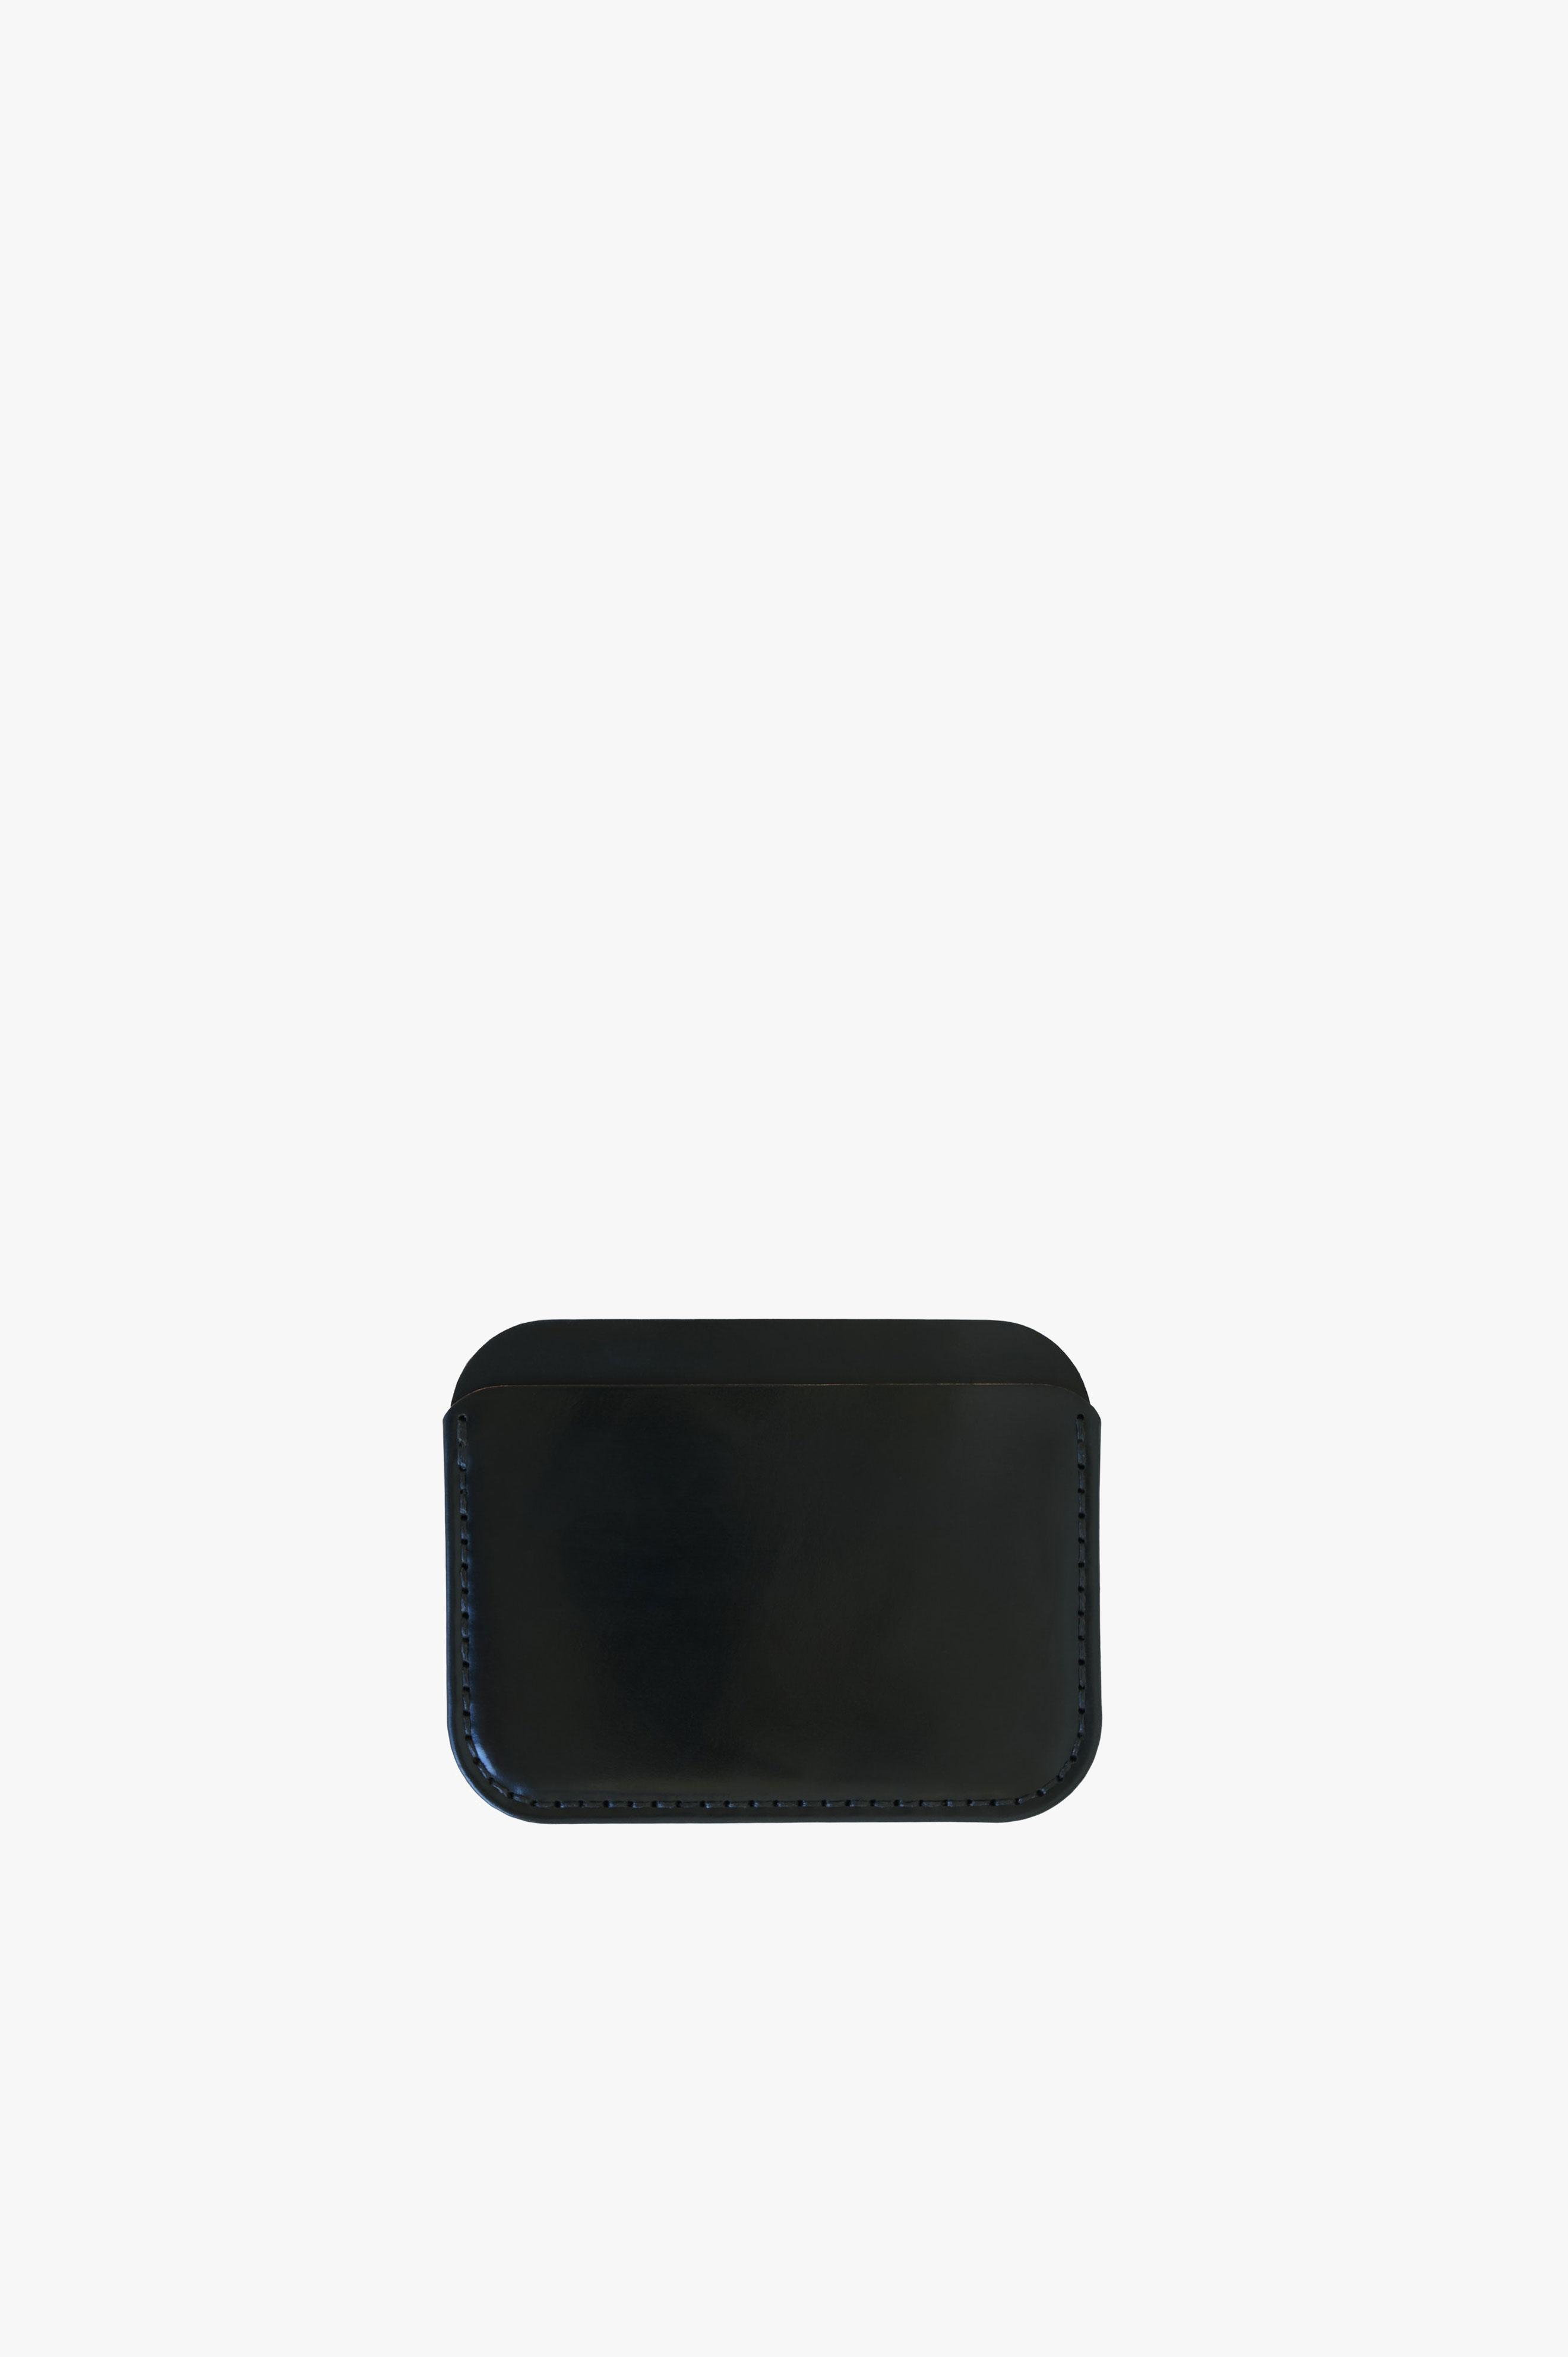 Round Luxe Wallet Black Essex Horween® Leather